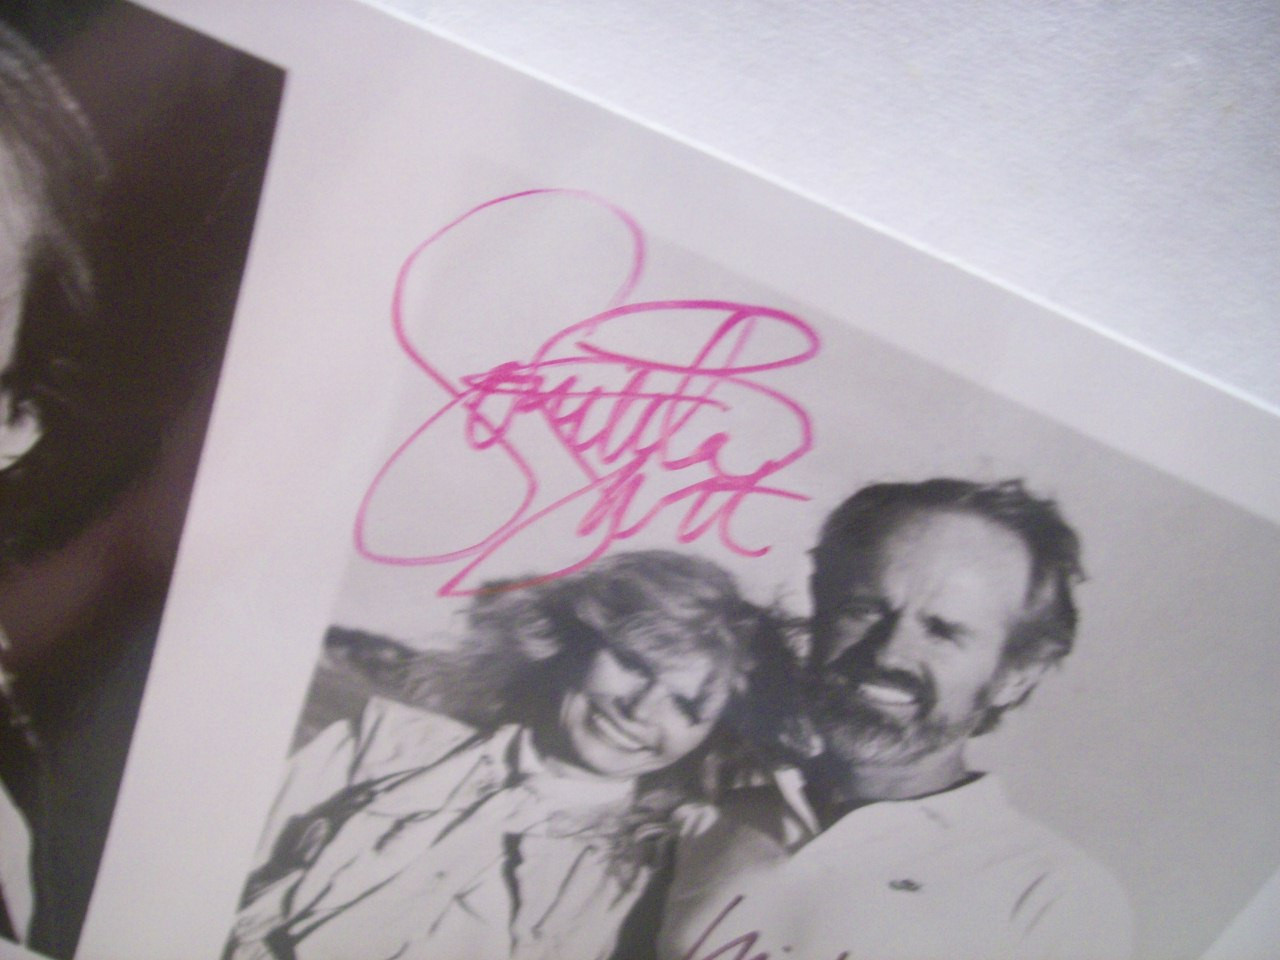 Farrell, Mike Loretta Swit Photo Signed Autograph Saving The Wildlife